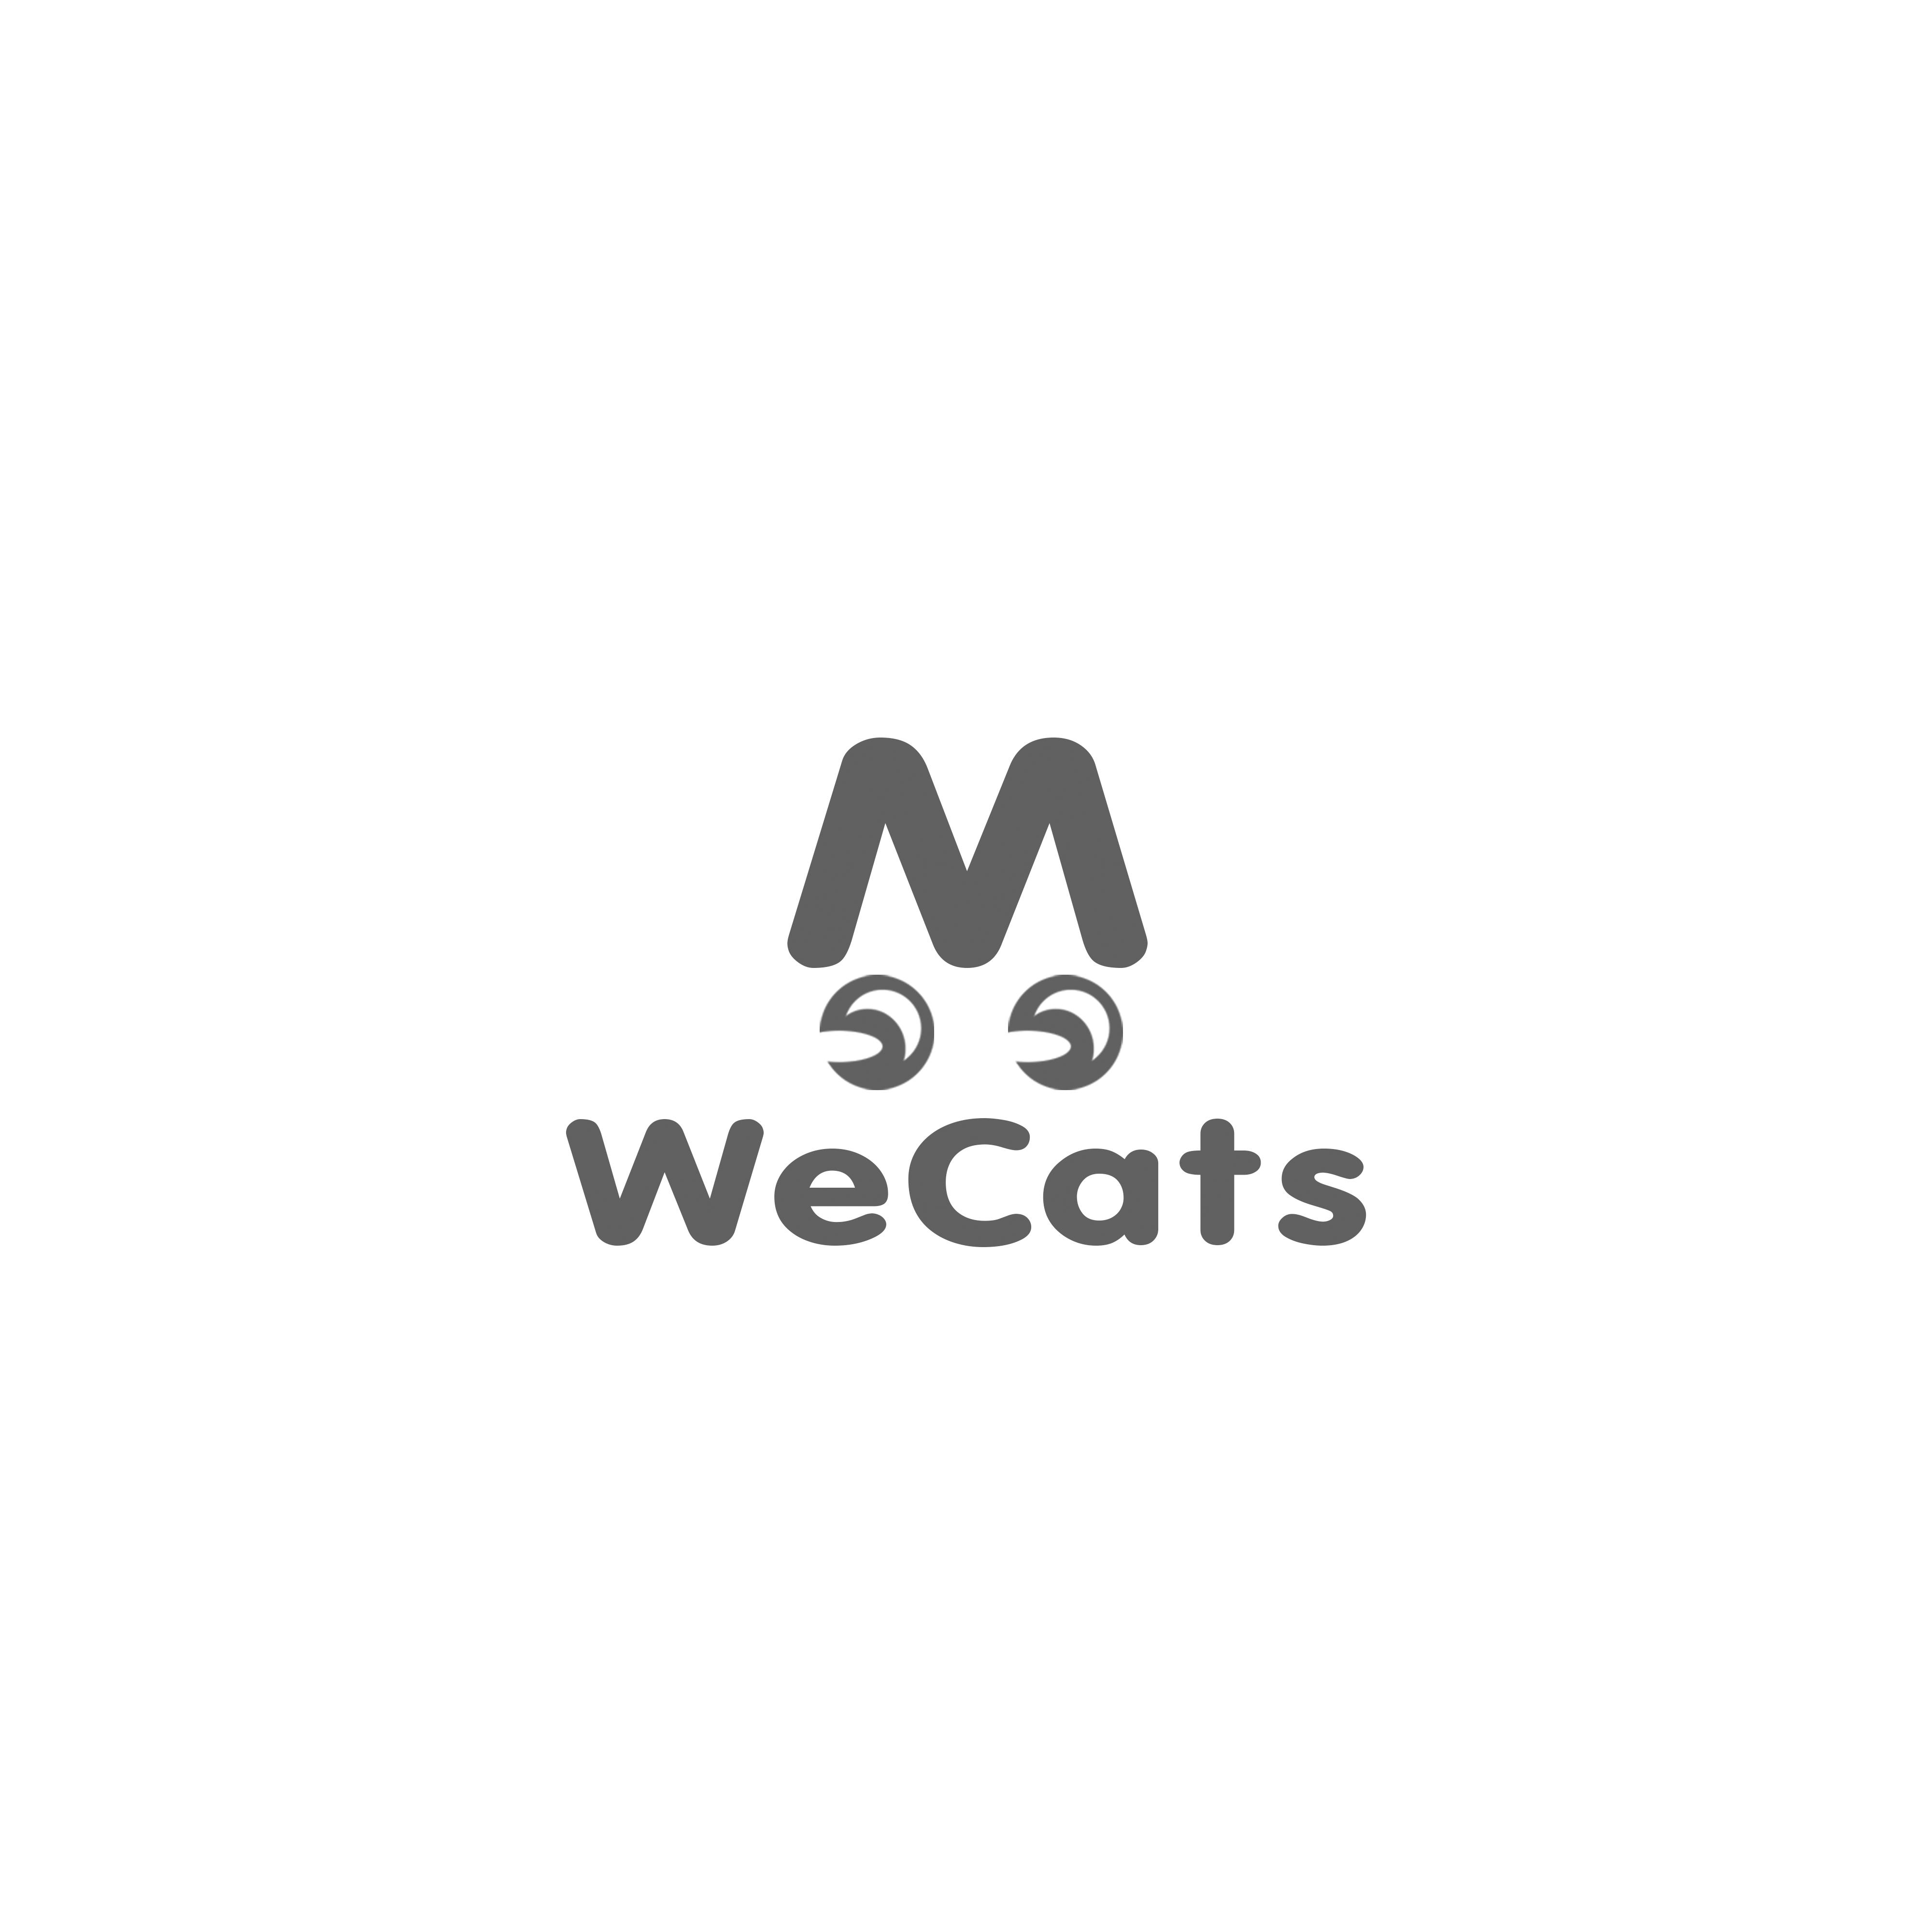 Создание логотипа WeCats фото f_4375f187487aa3c4.jpg